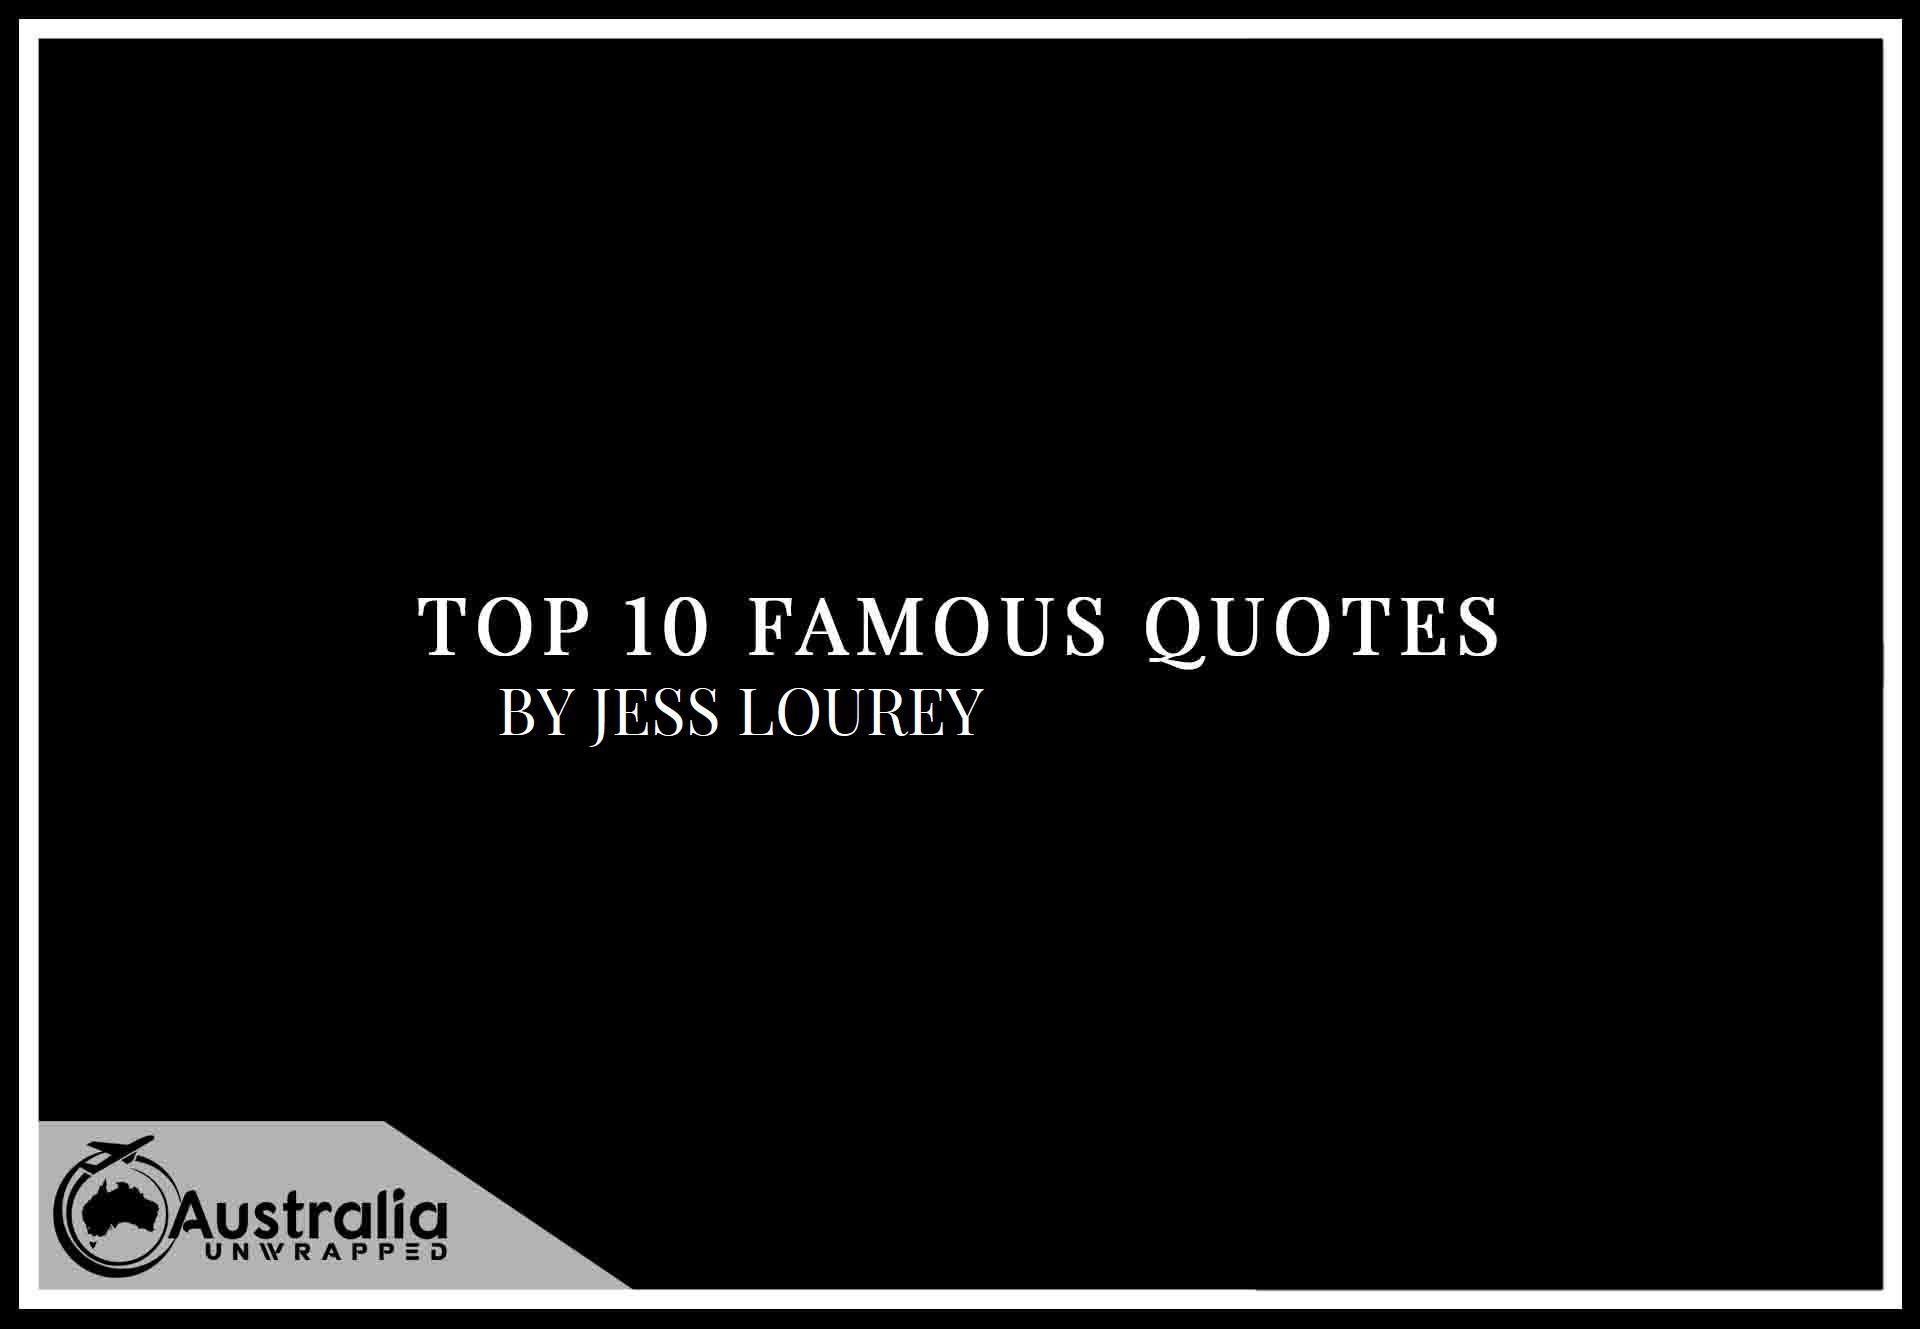 Top 10 Famous Quotes by Author Jess Lourey